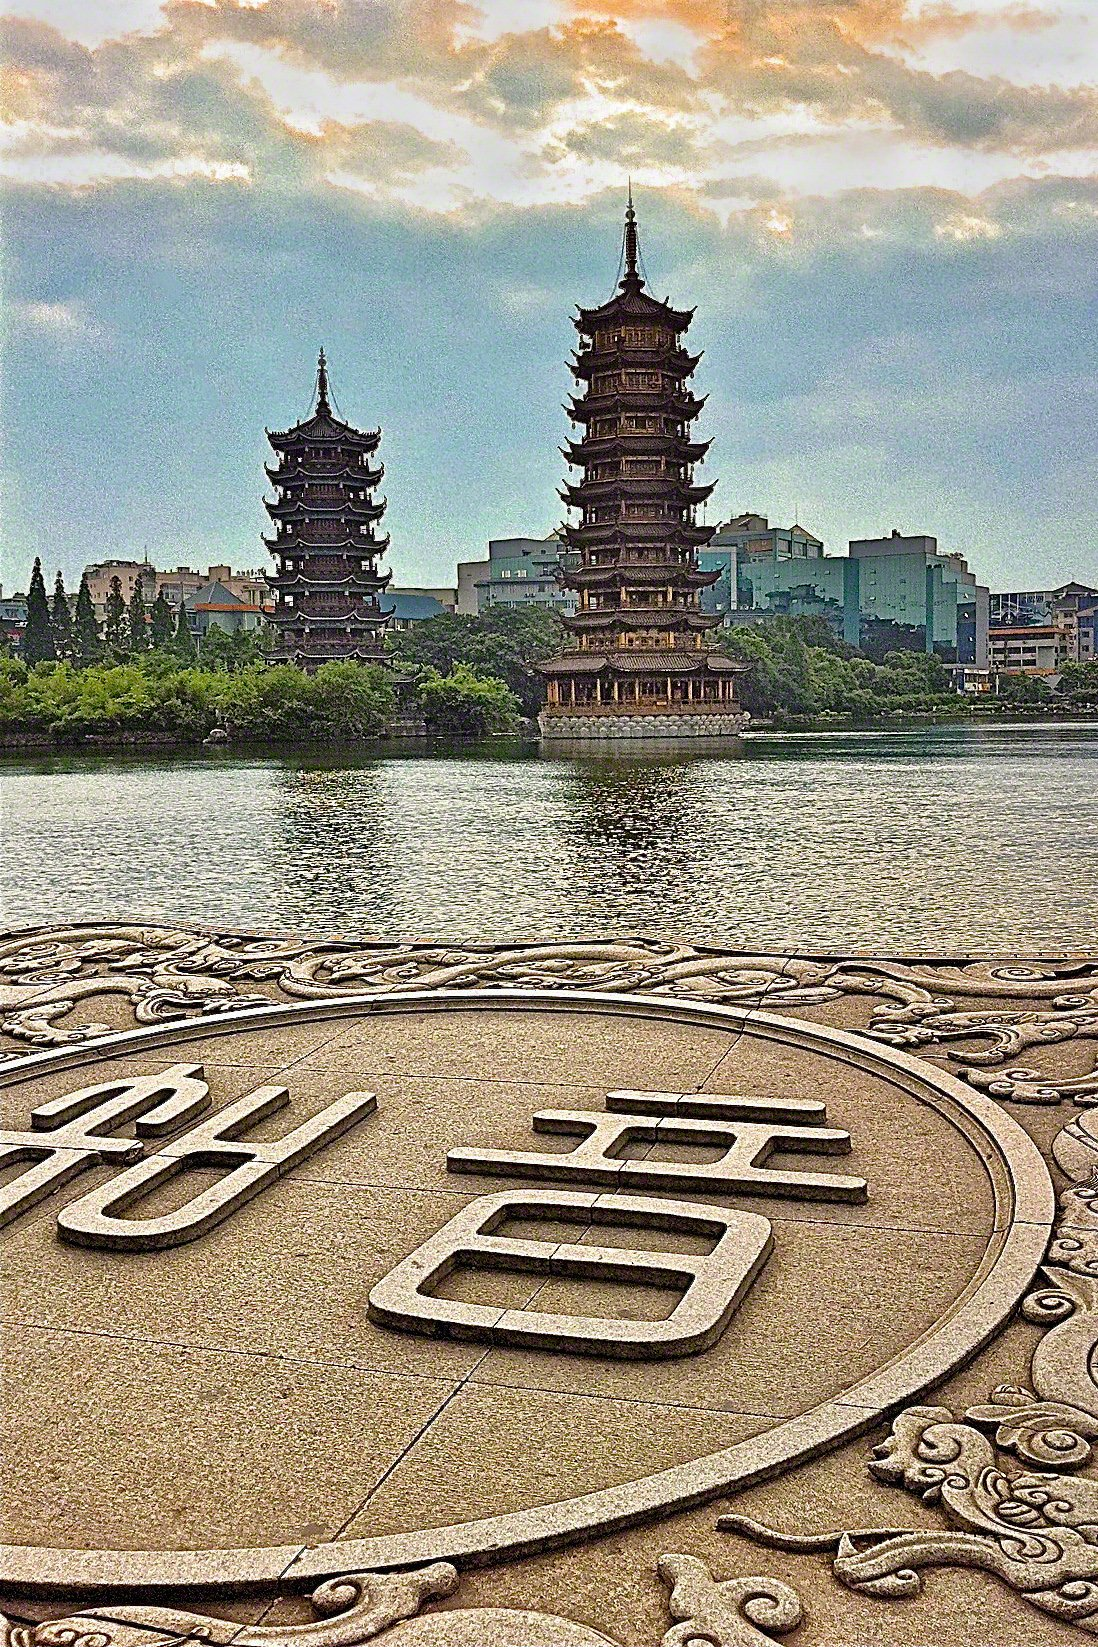 Fir Lake Pagodas